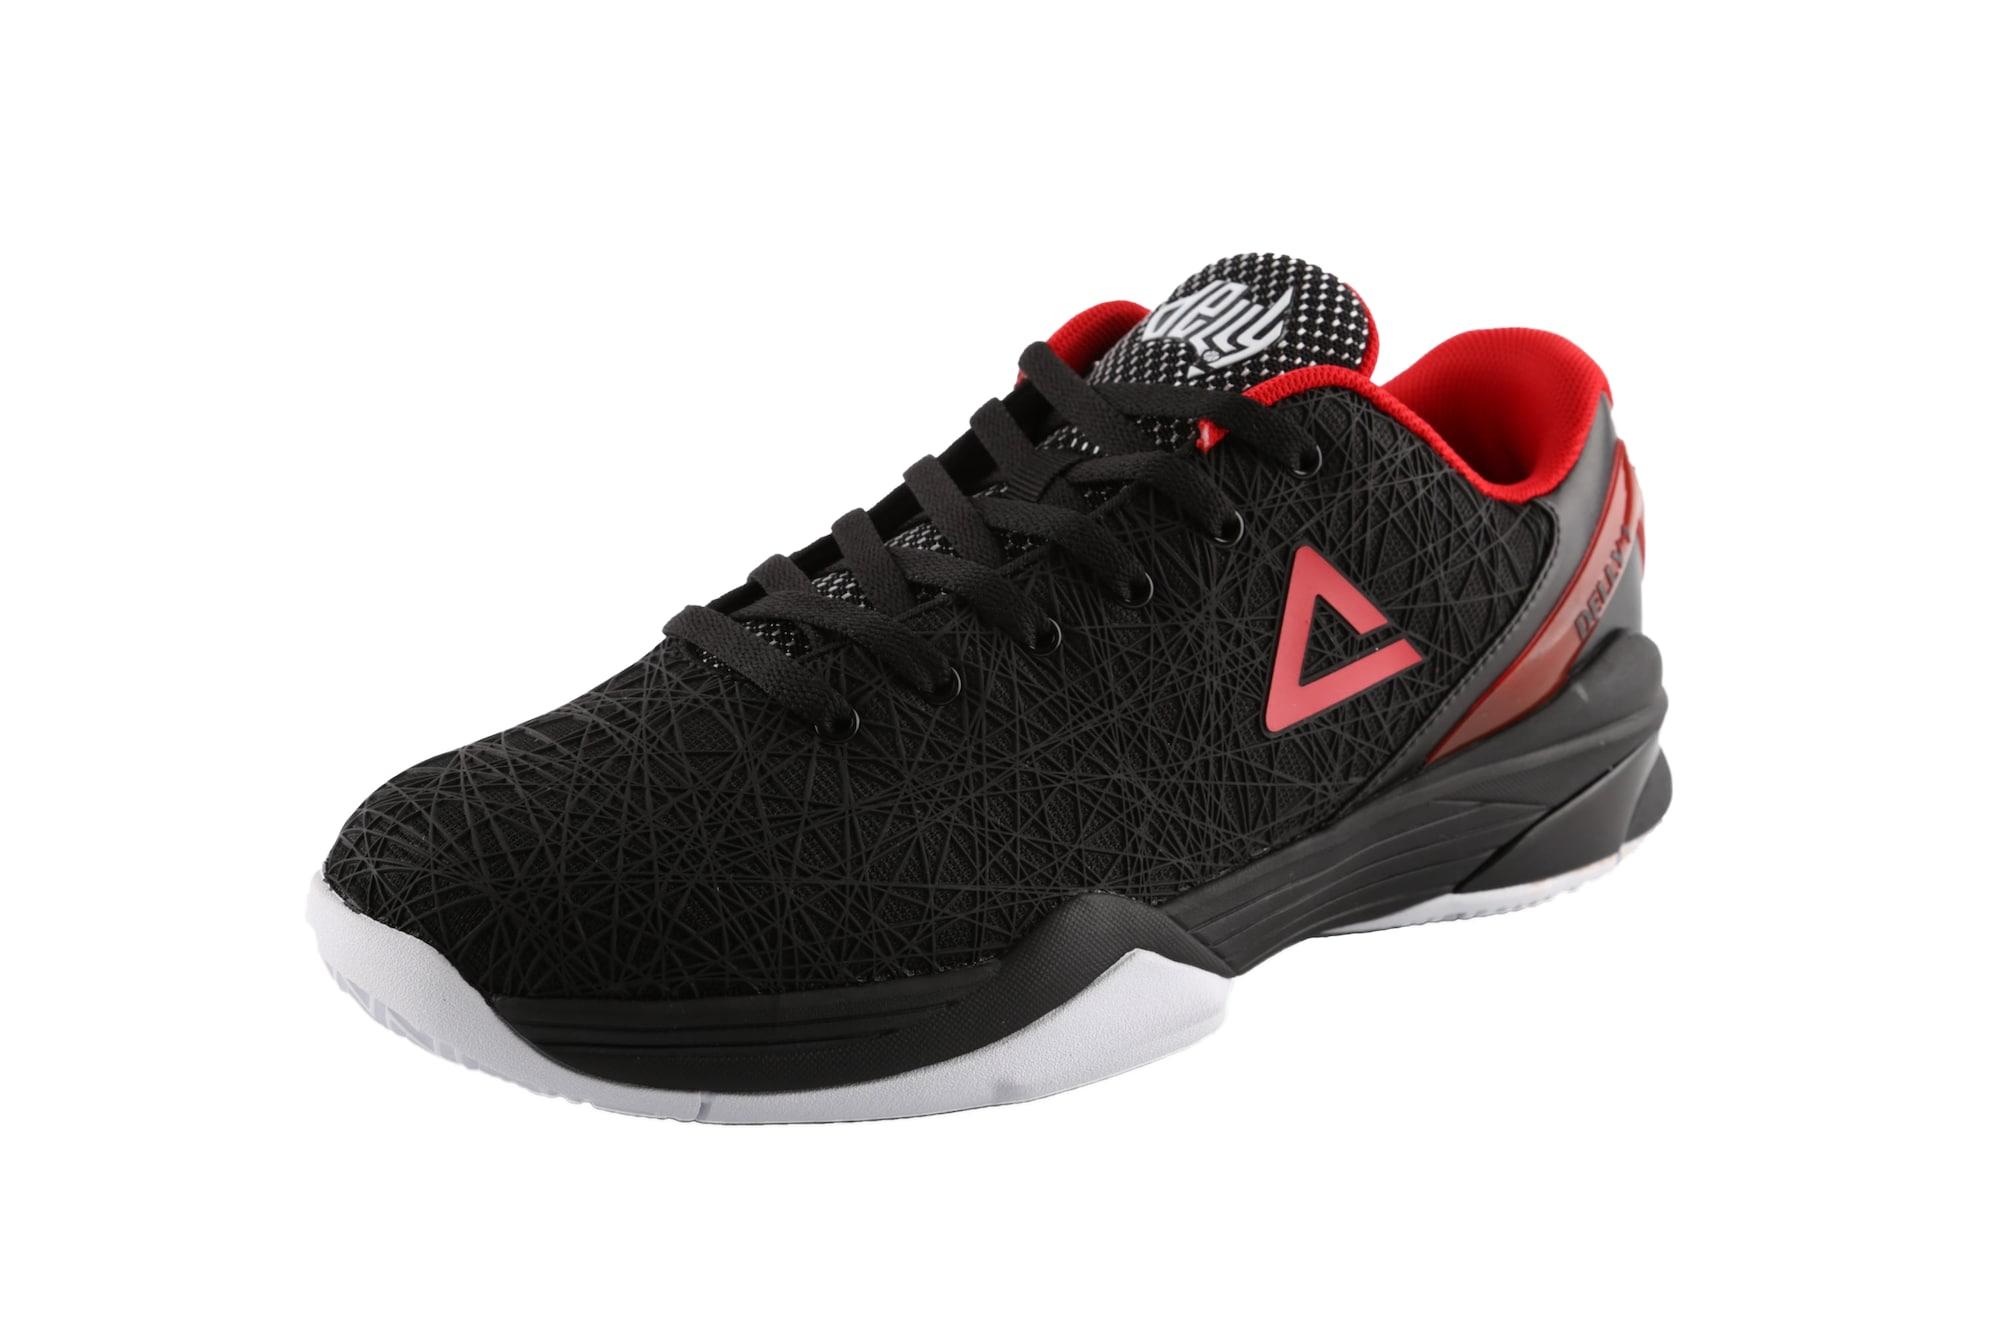 Basketballschuh 'Delly' | Schuhe > Sportschuhe > Basketballschuhe | Peak